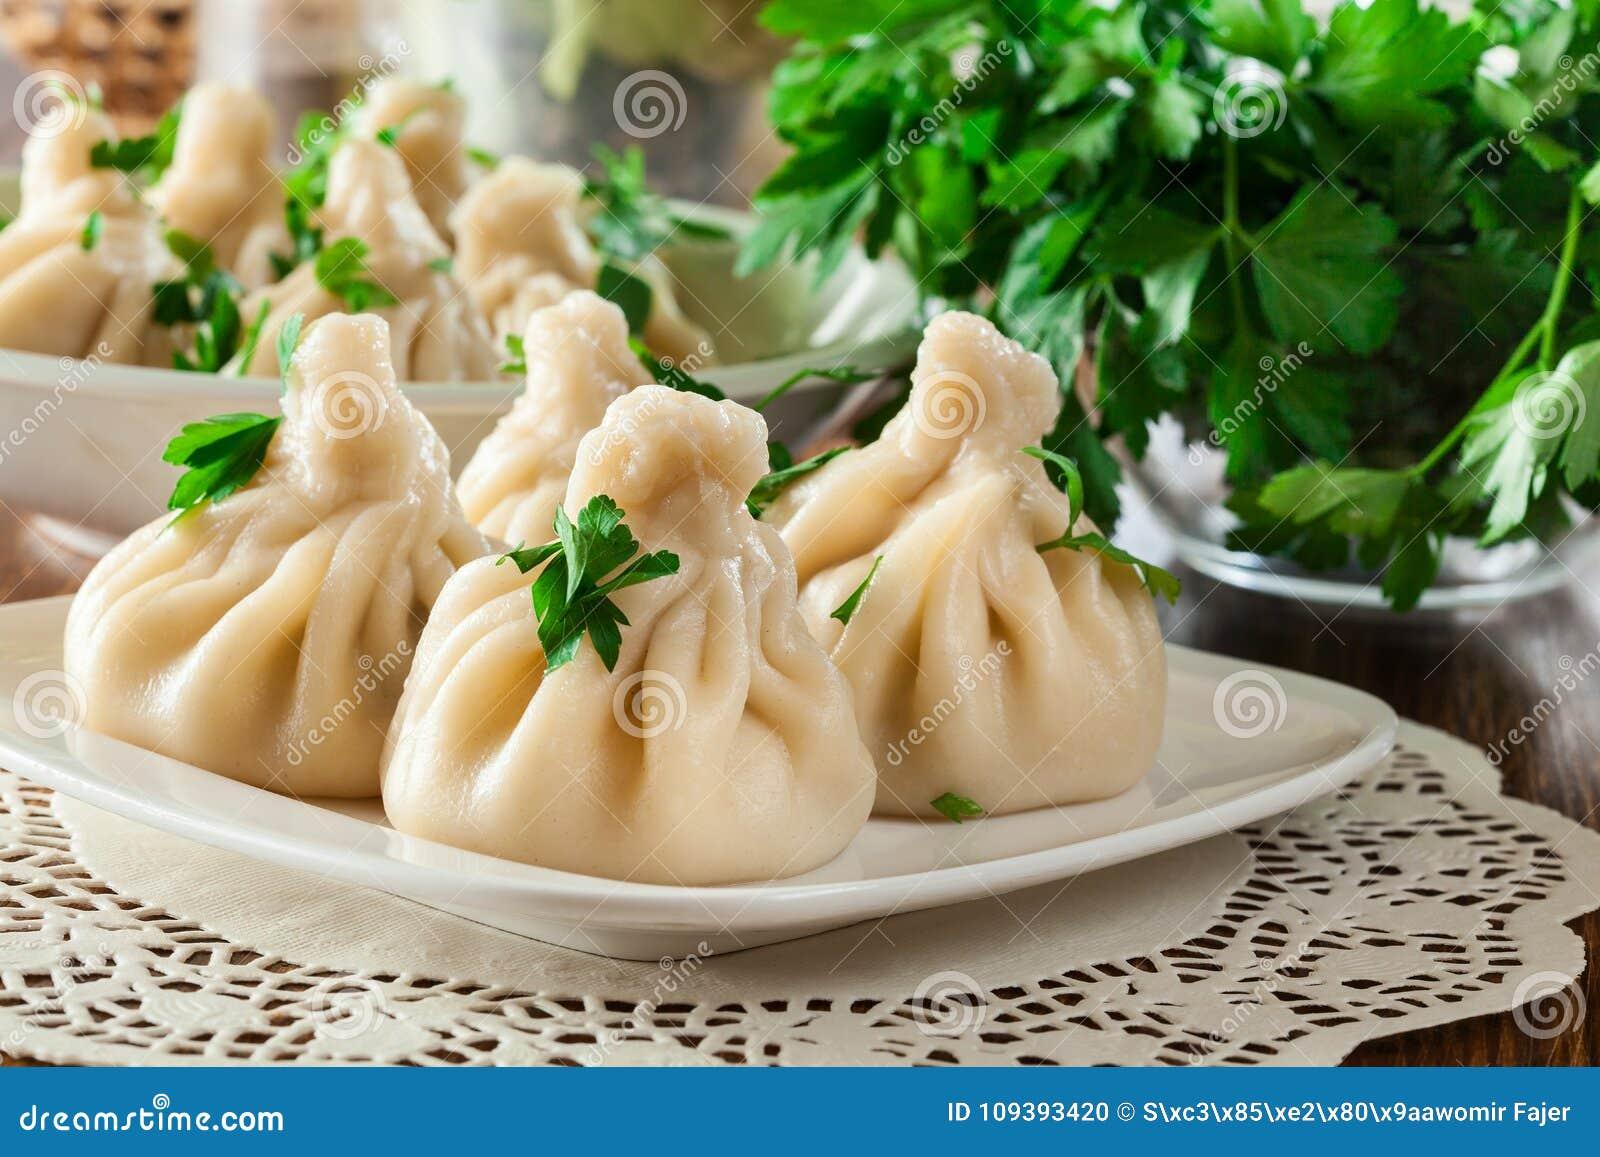 Georgian dumplings - Khinkali Chinkali with minced meat and herbs